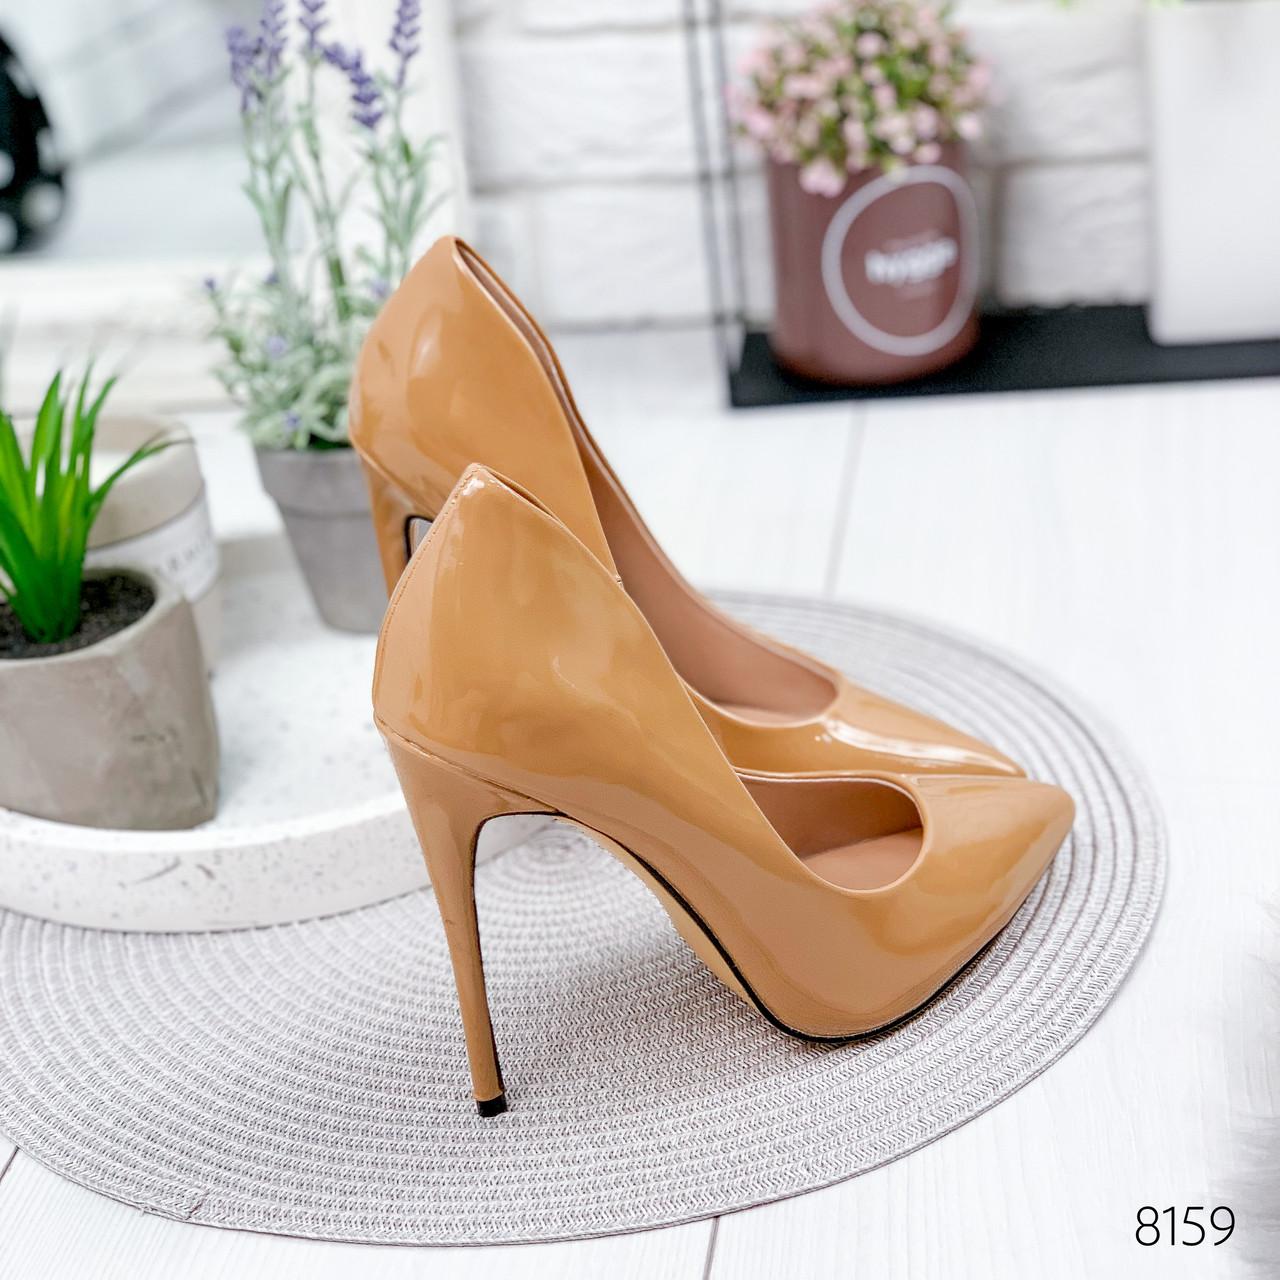 Туфли женские Stella беж 8159